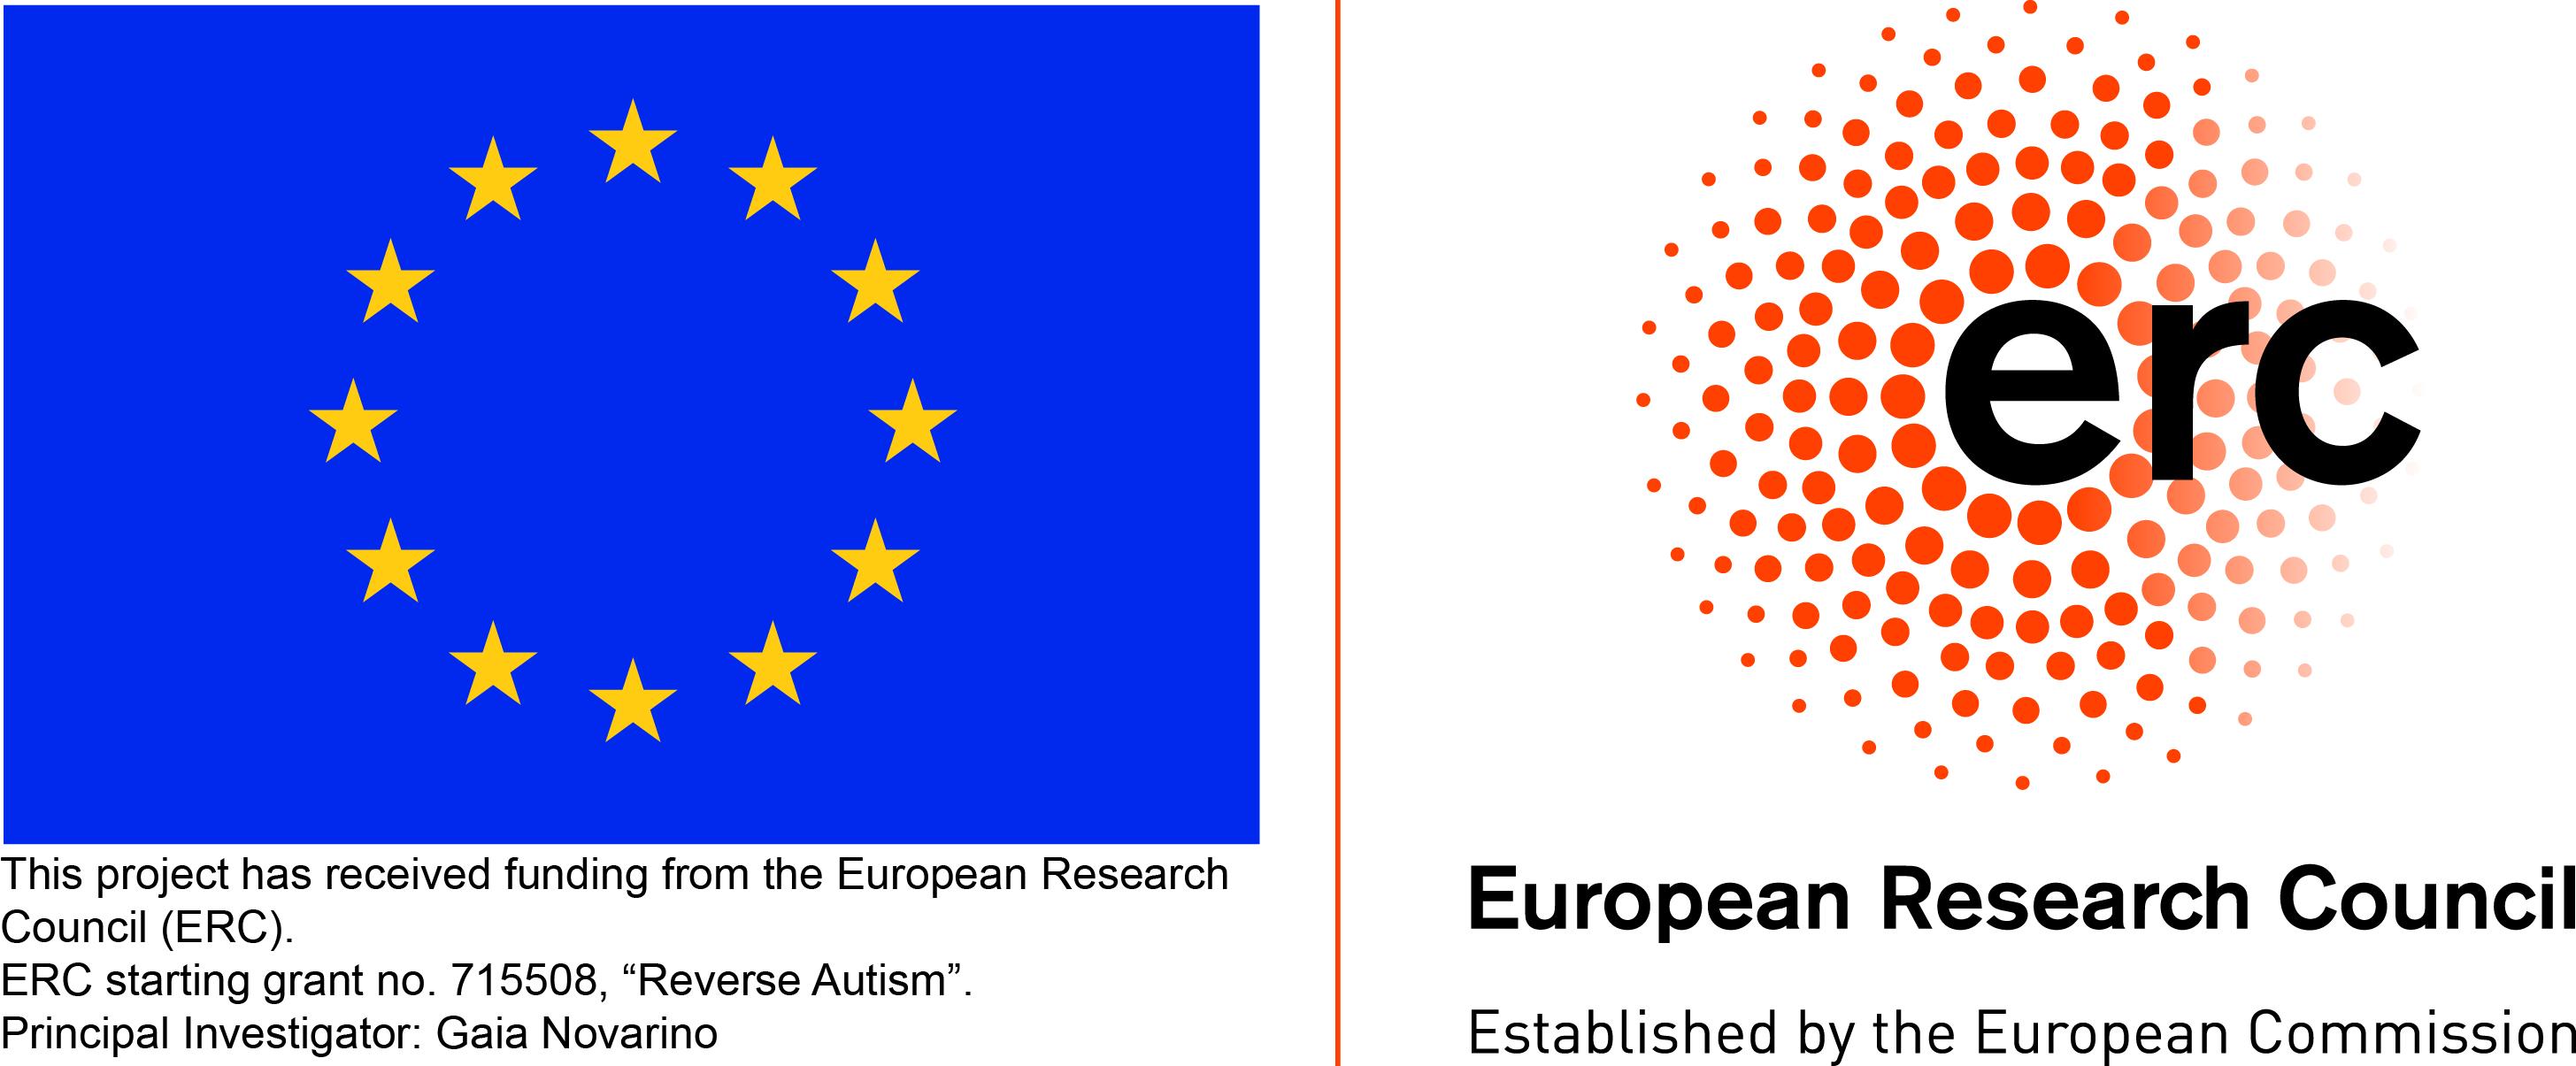 LOGO_ERC-FLAG_EU